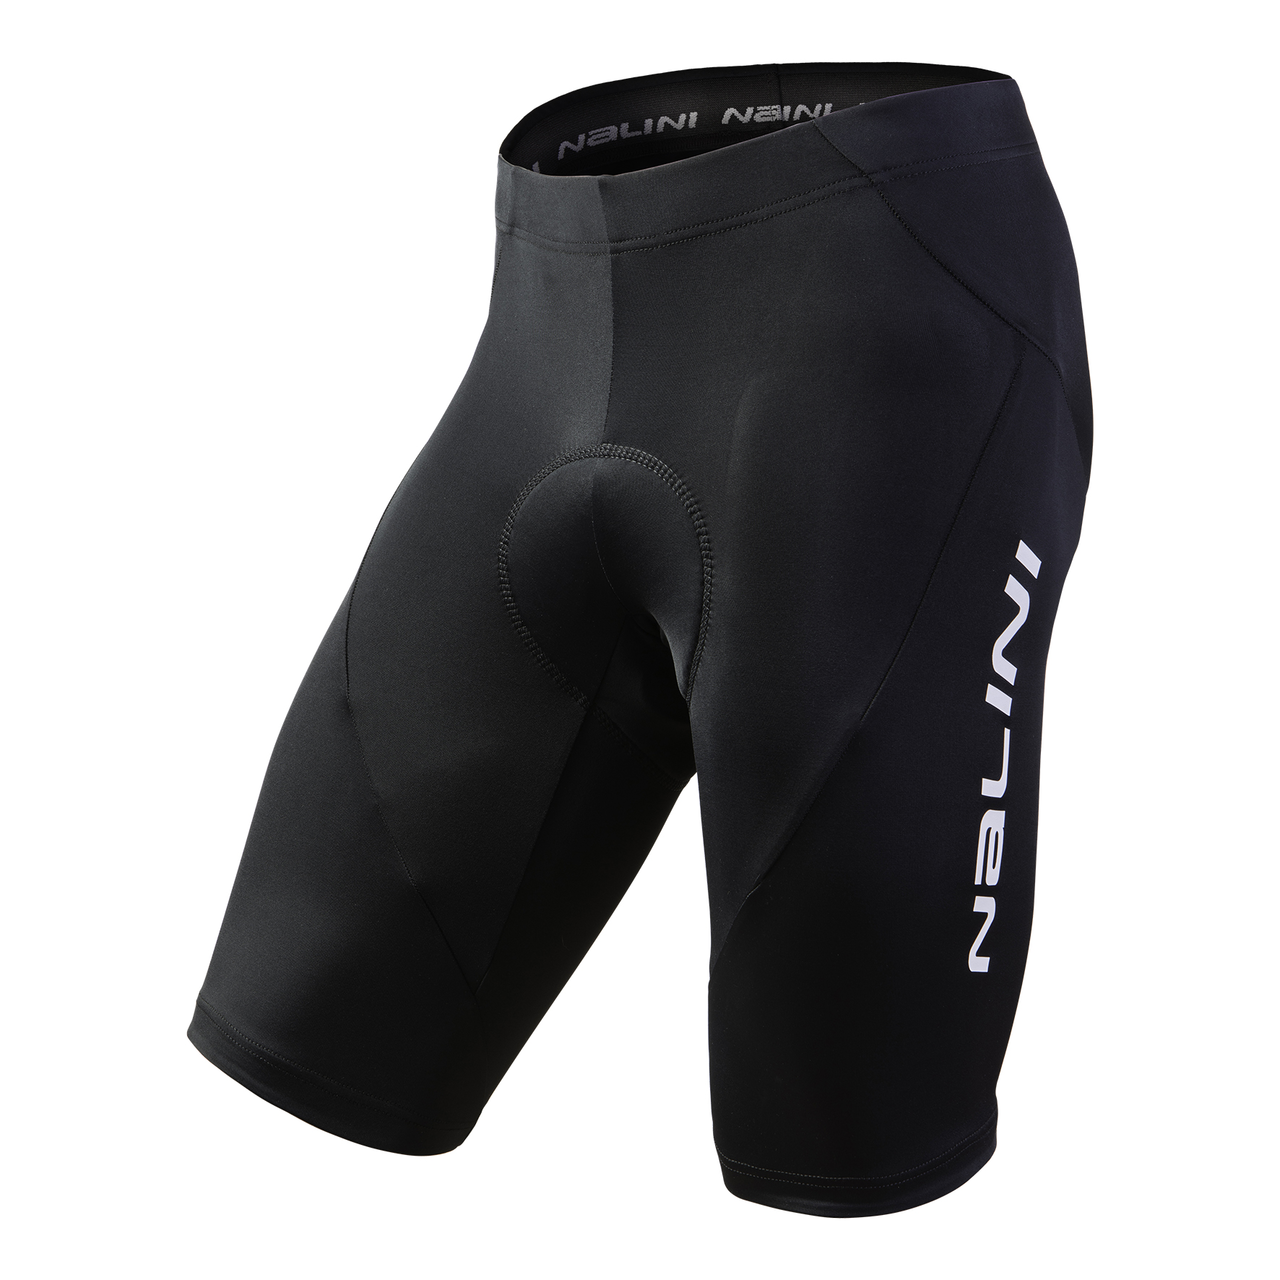 Nalini Gruppo Waist Black Shorts